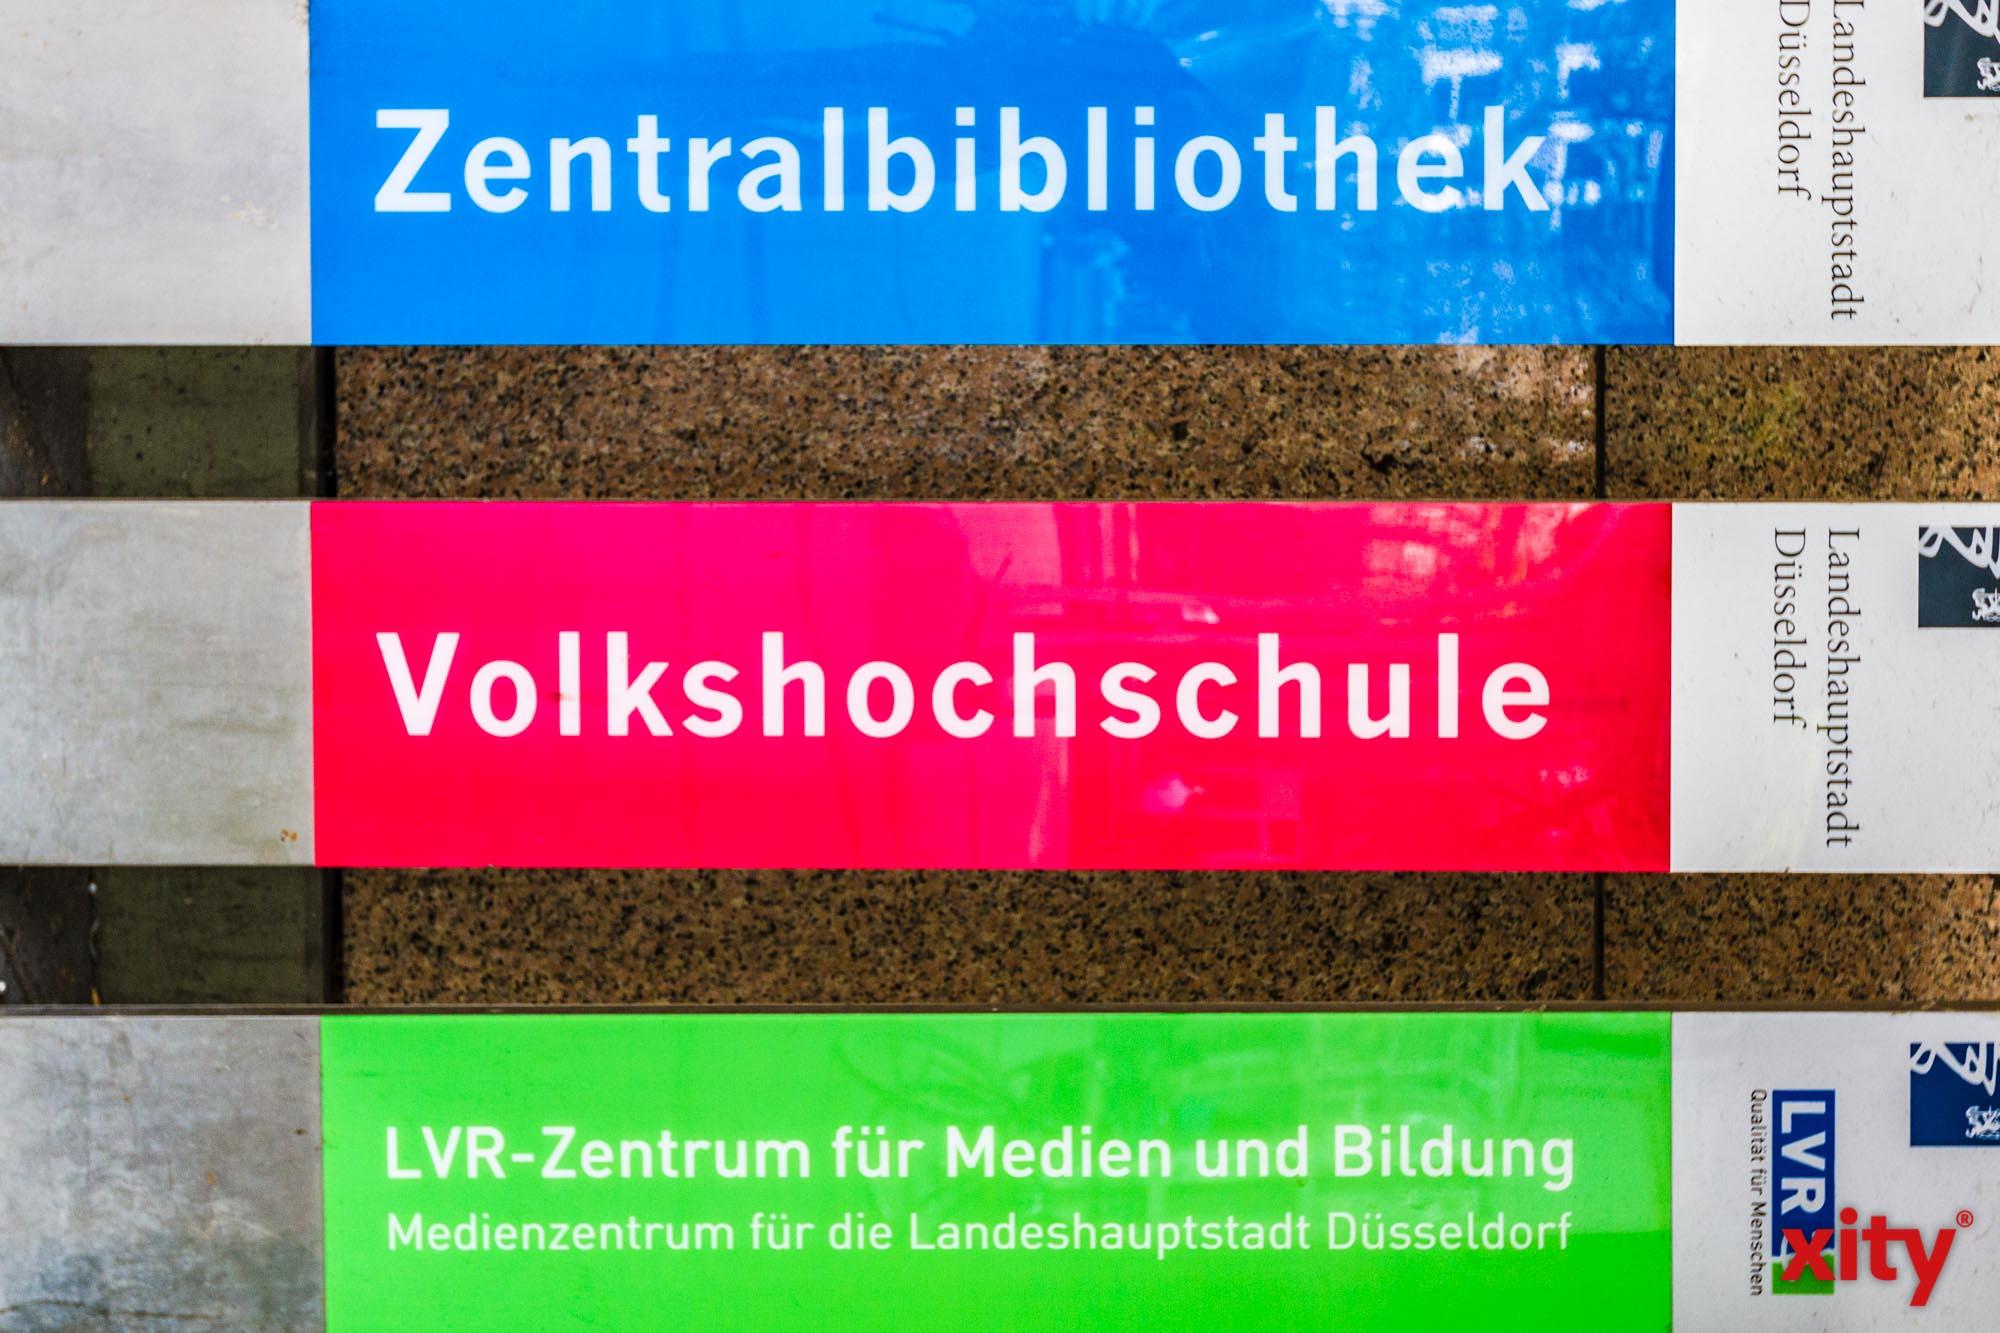 Digitale Lesung in der Zentralbibliothek Düsseldorf (Foto: xity)